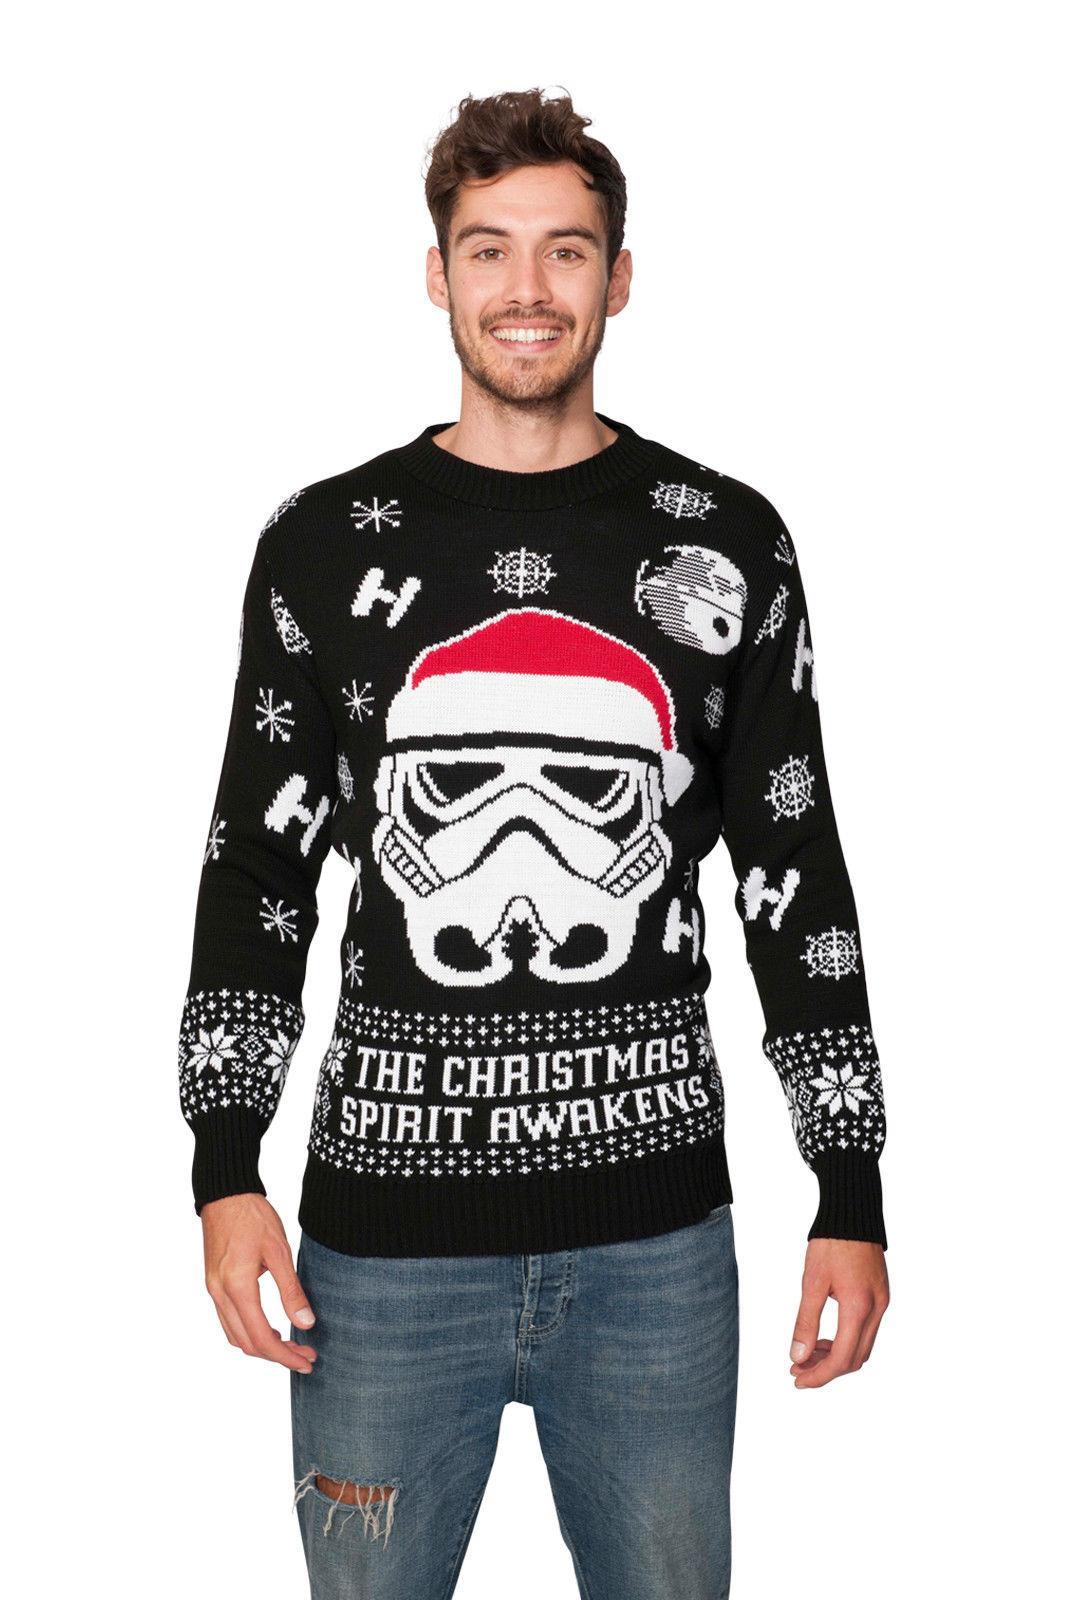 Storm Trooper Star Wars vánoční svetr empty 87b6c5be64